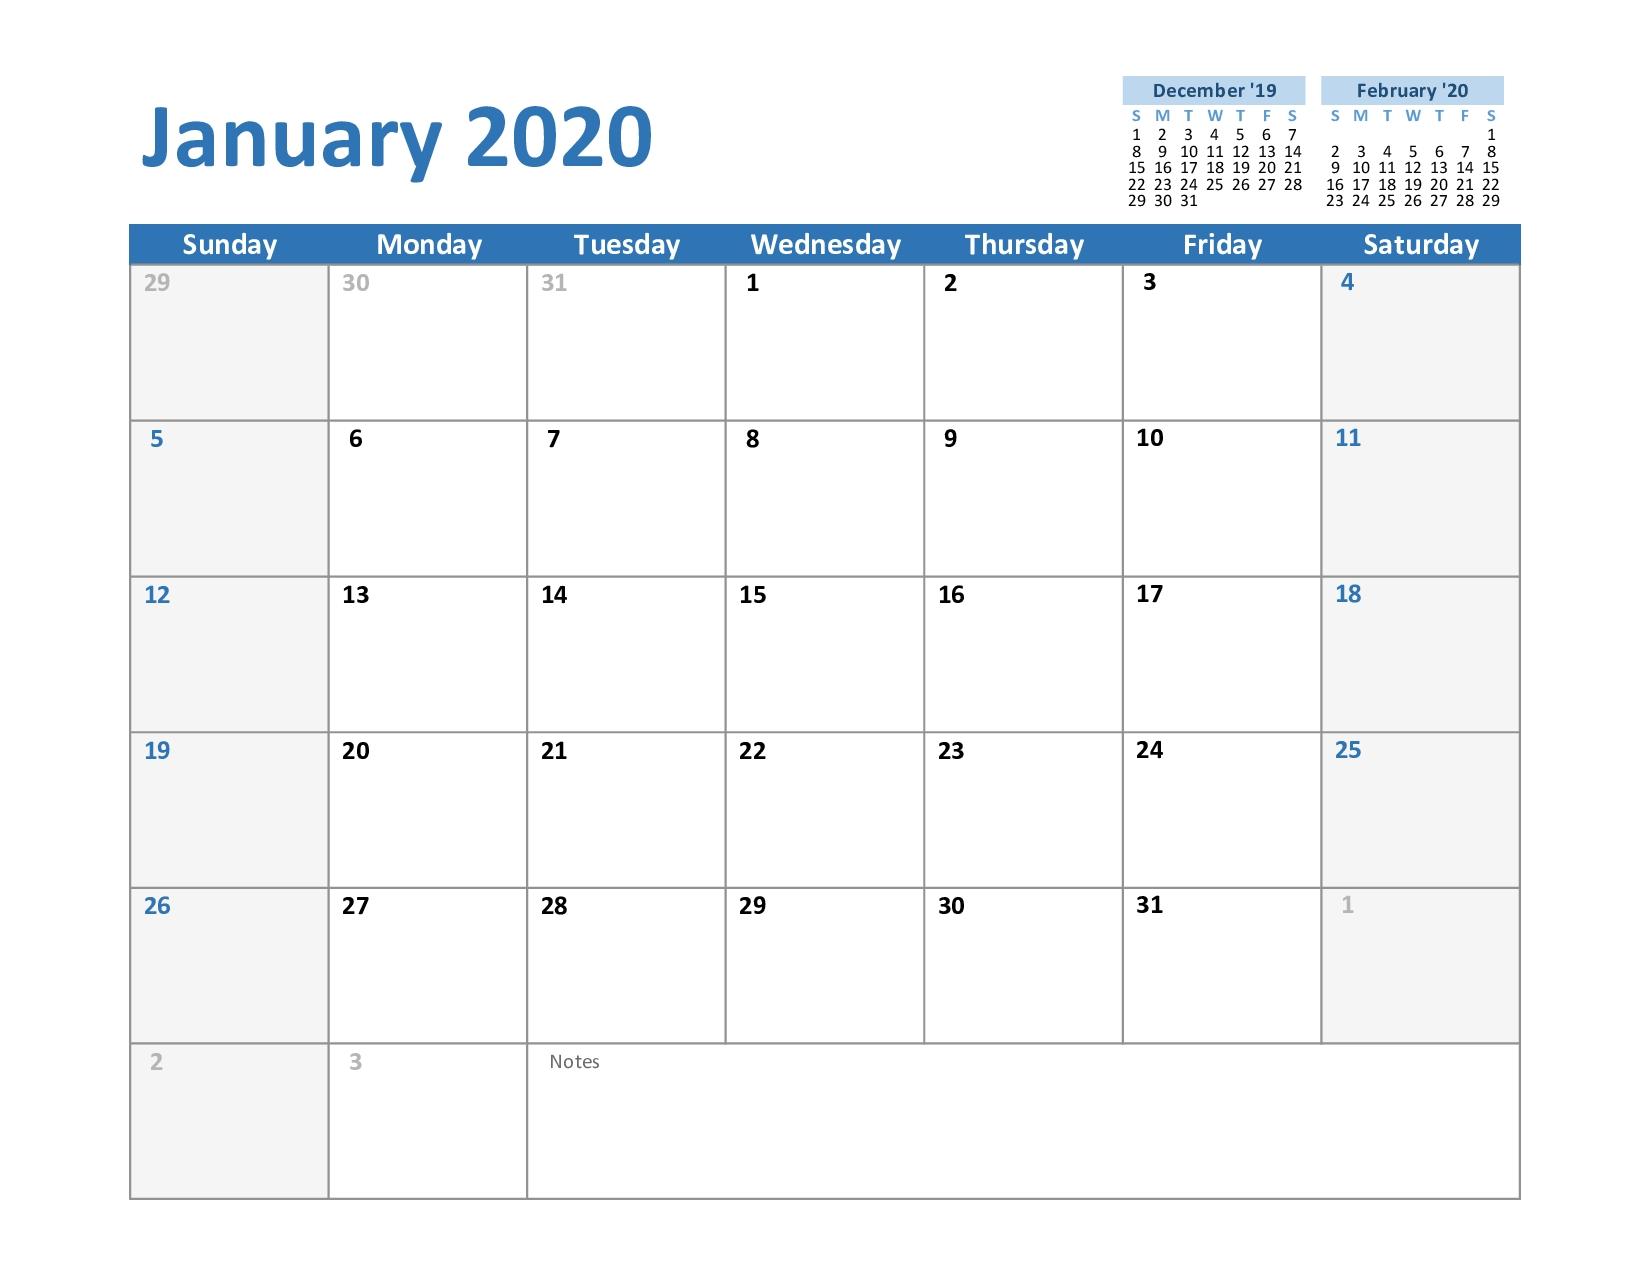 Printable January 2020 Calendar - Free Blank Templates regarding 2020 Employee Attendance Calendar Free